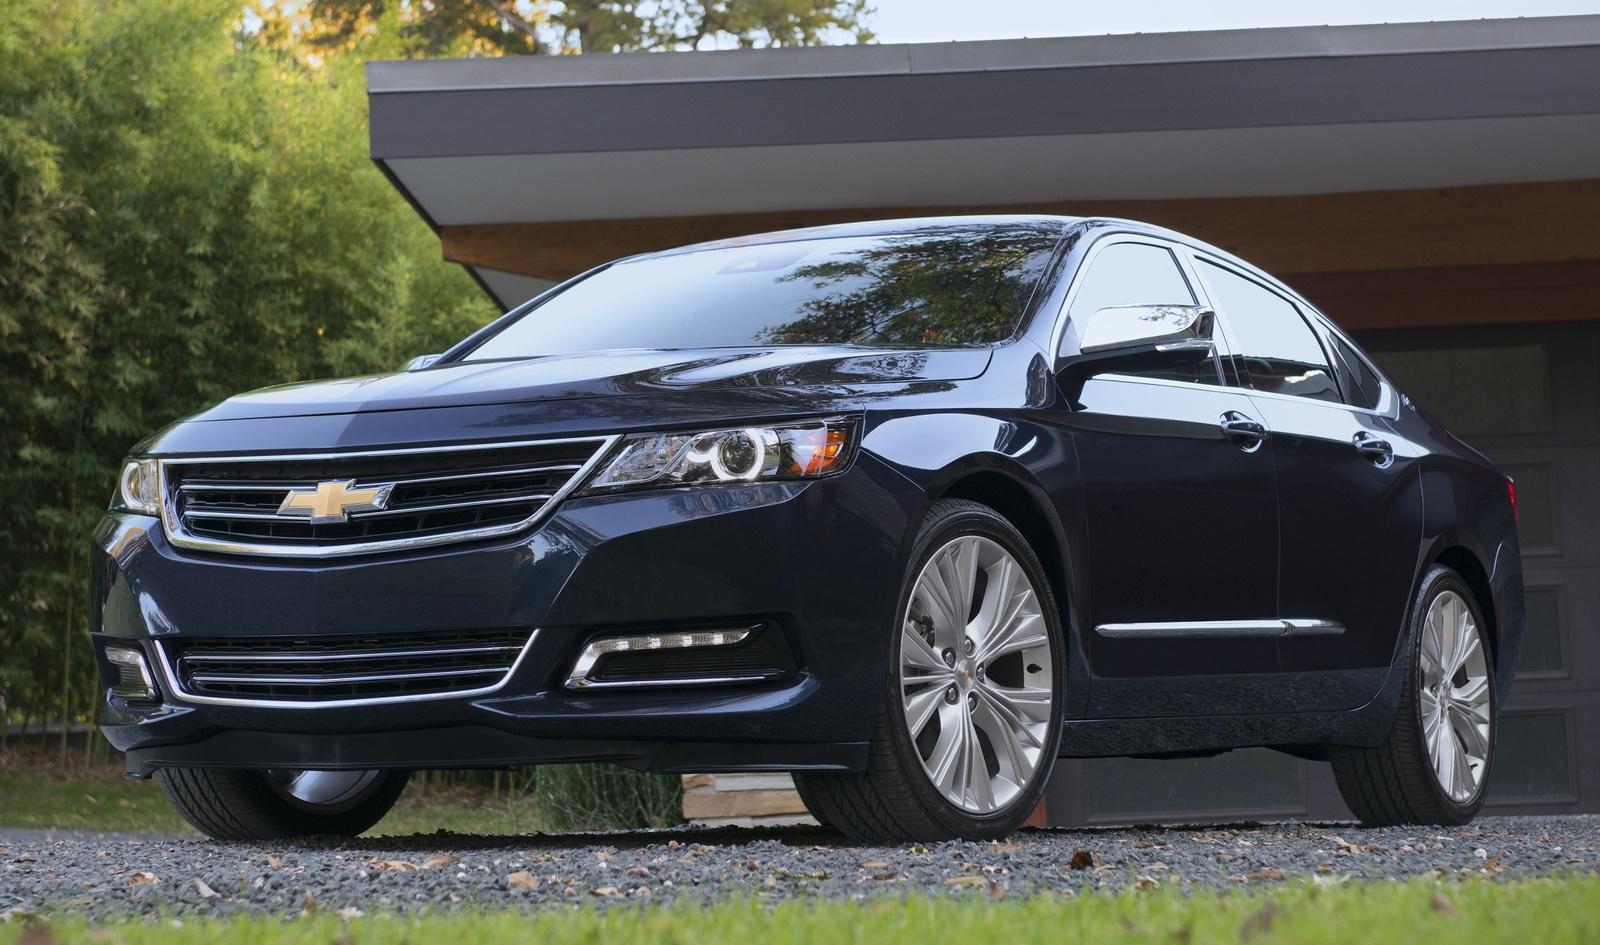 800 1024 1280 1600 origin 2015 chevrolet impala